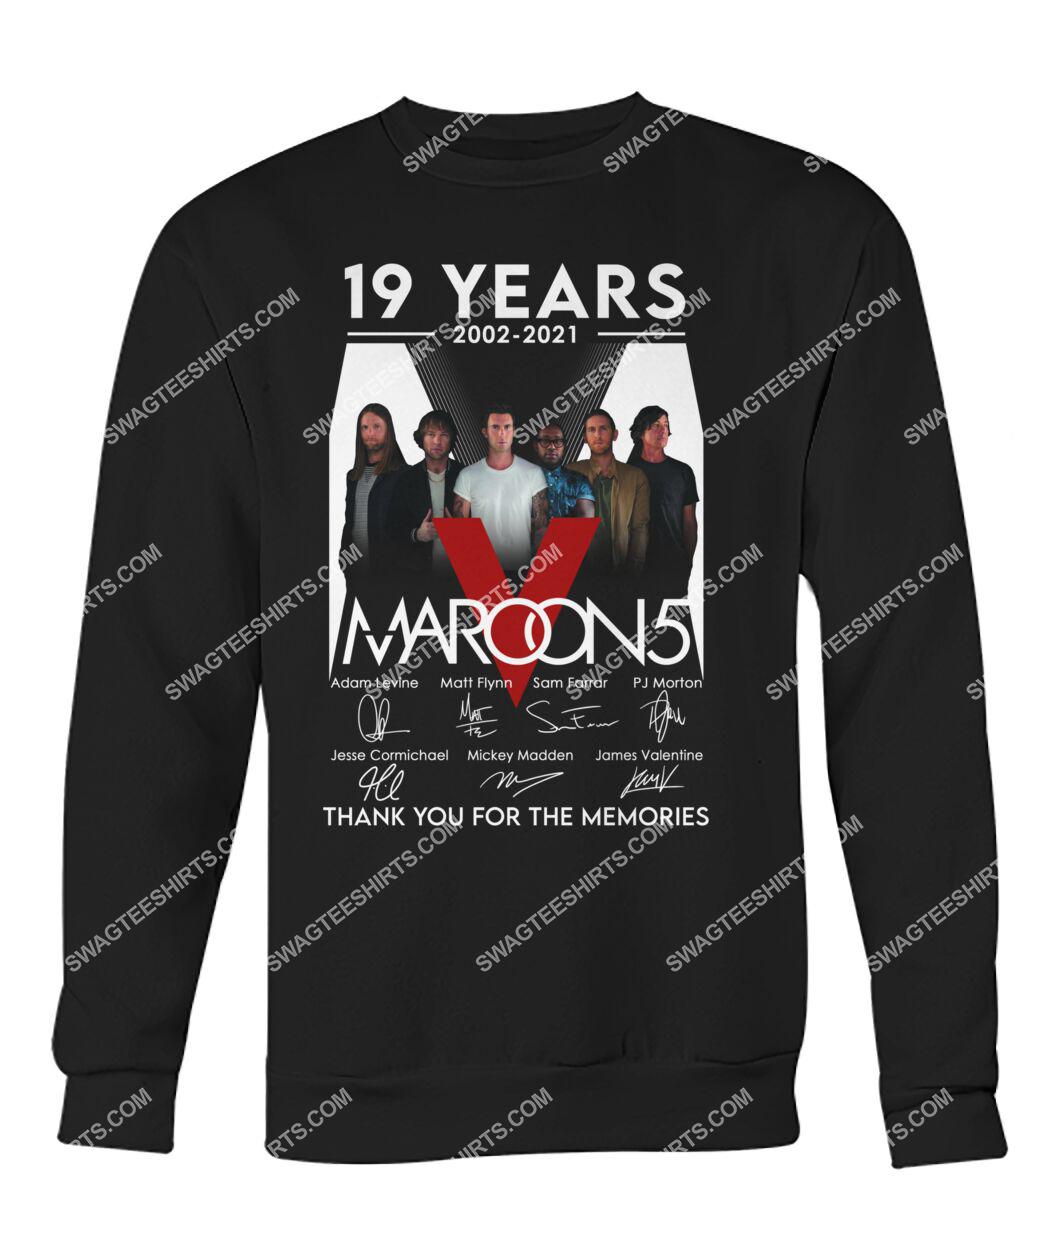 maroon 5 19 years thank you for memories signature sweatshirt 1